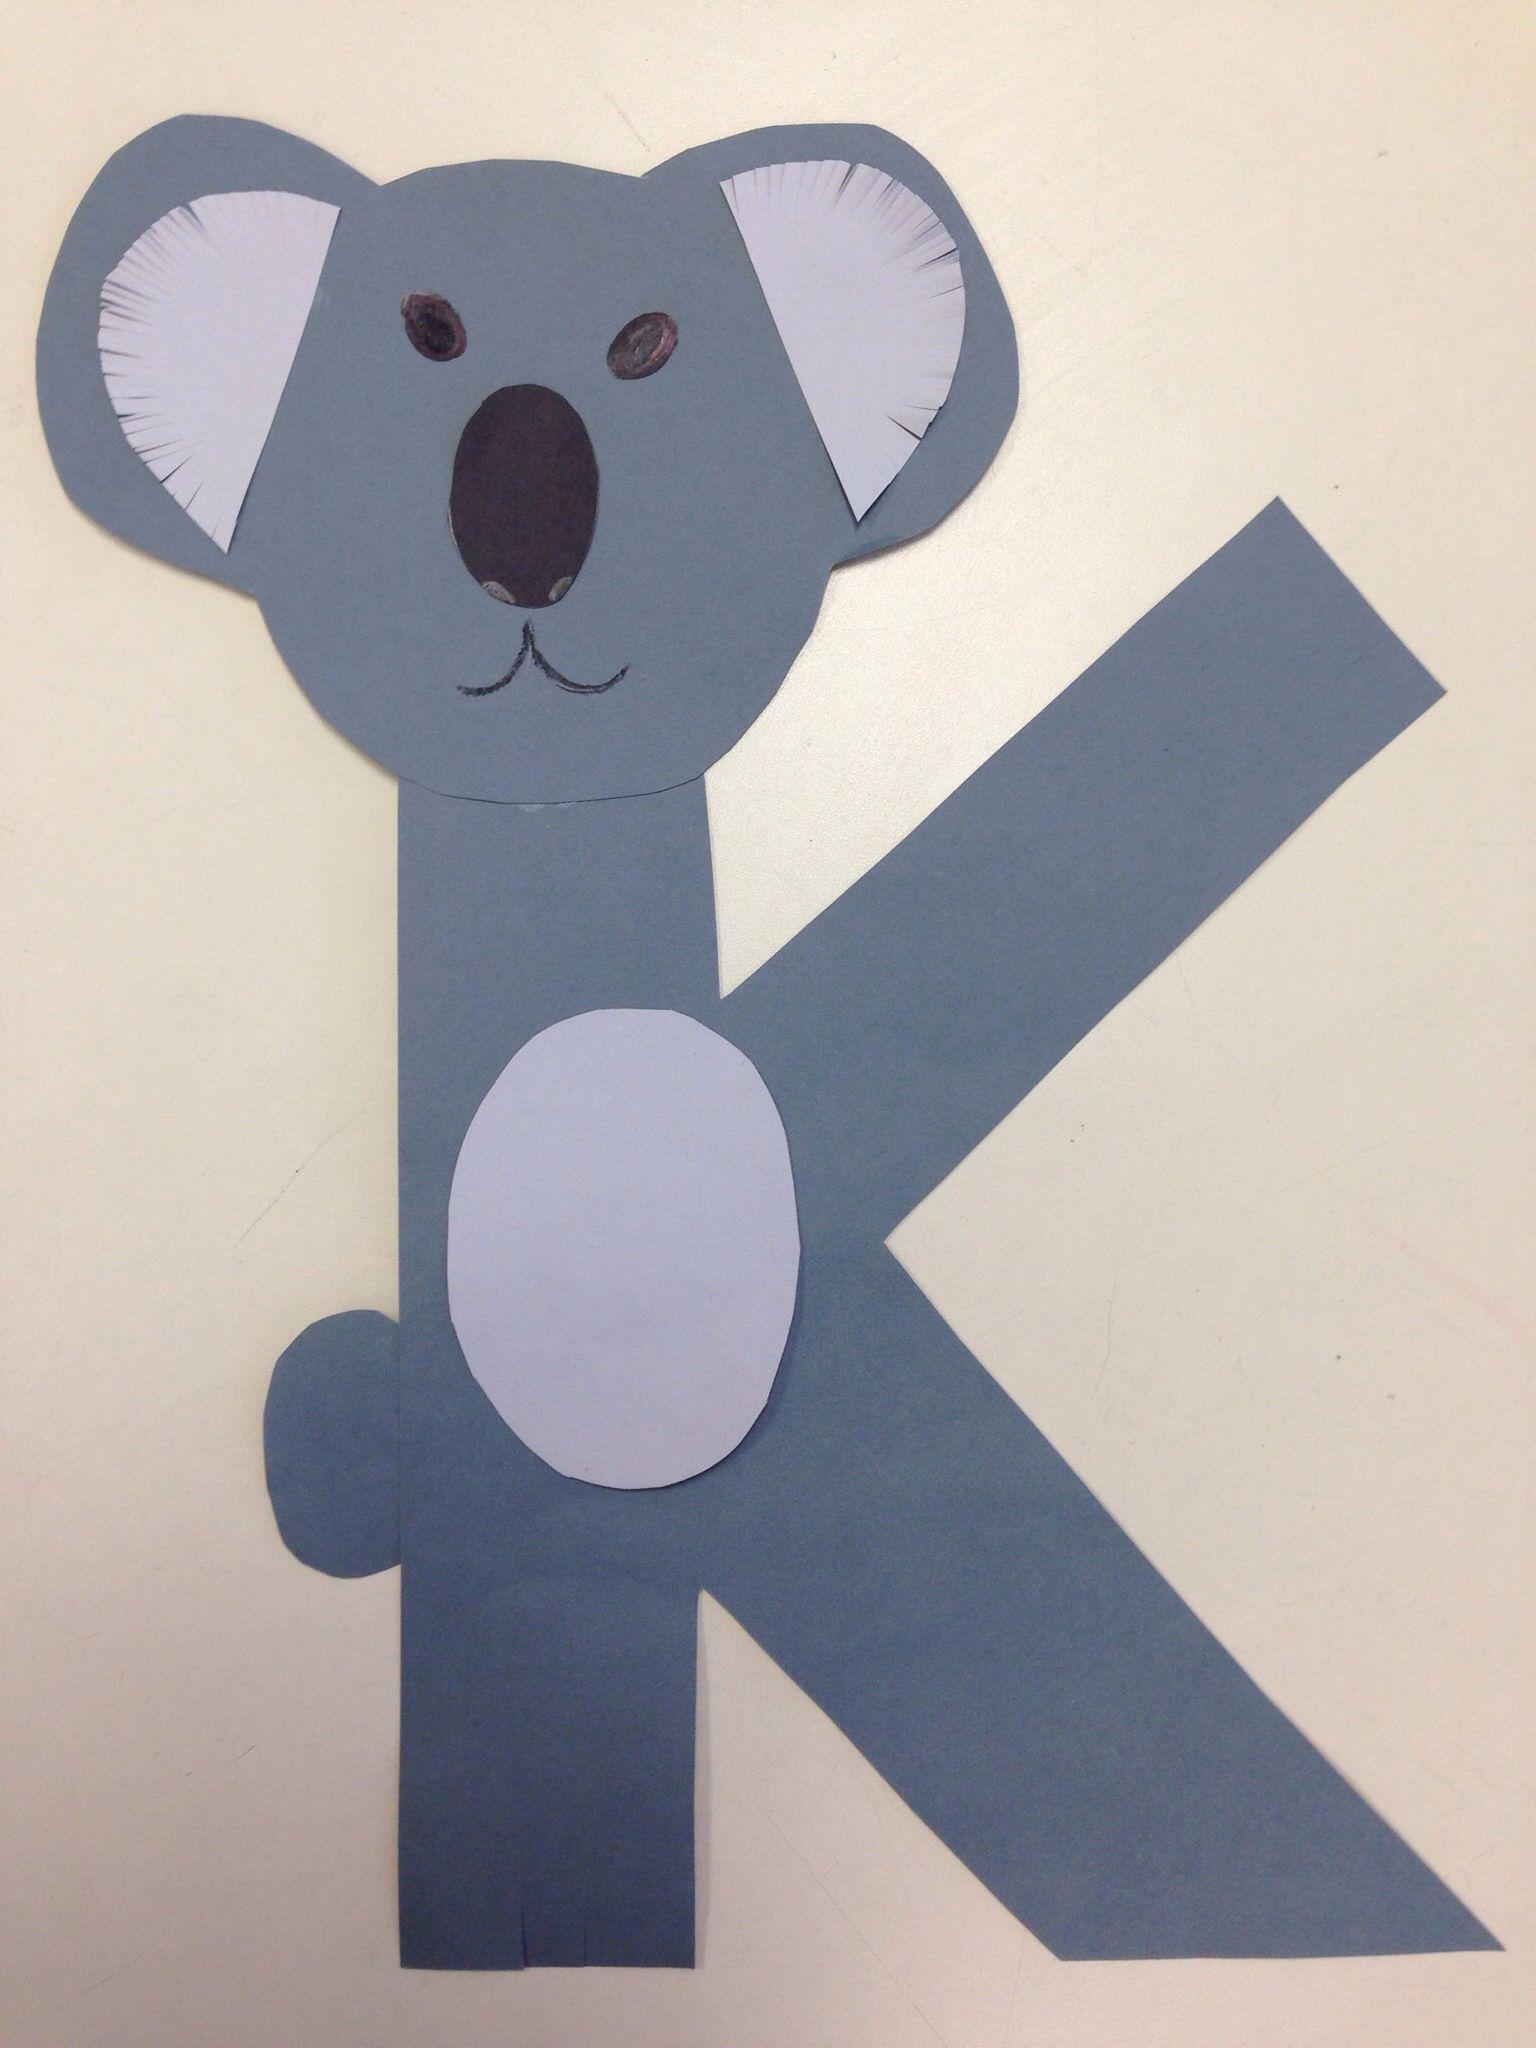 K For Koala Preschool K Crafts Children K Crafts Alphabet